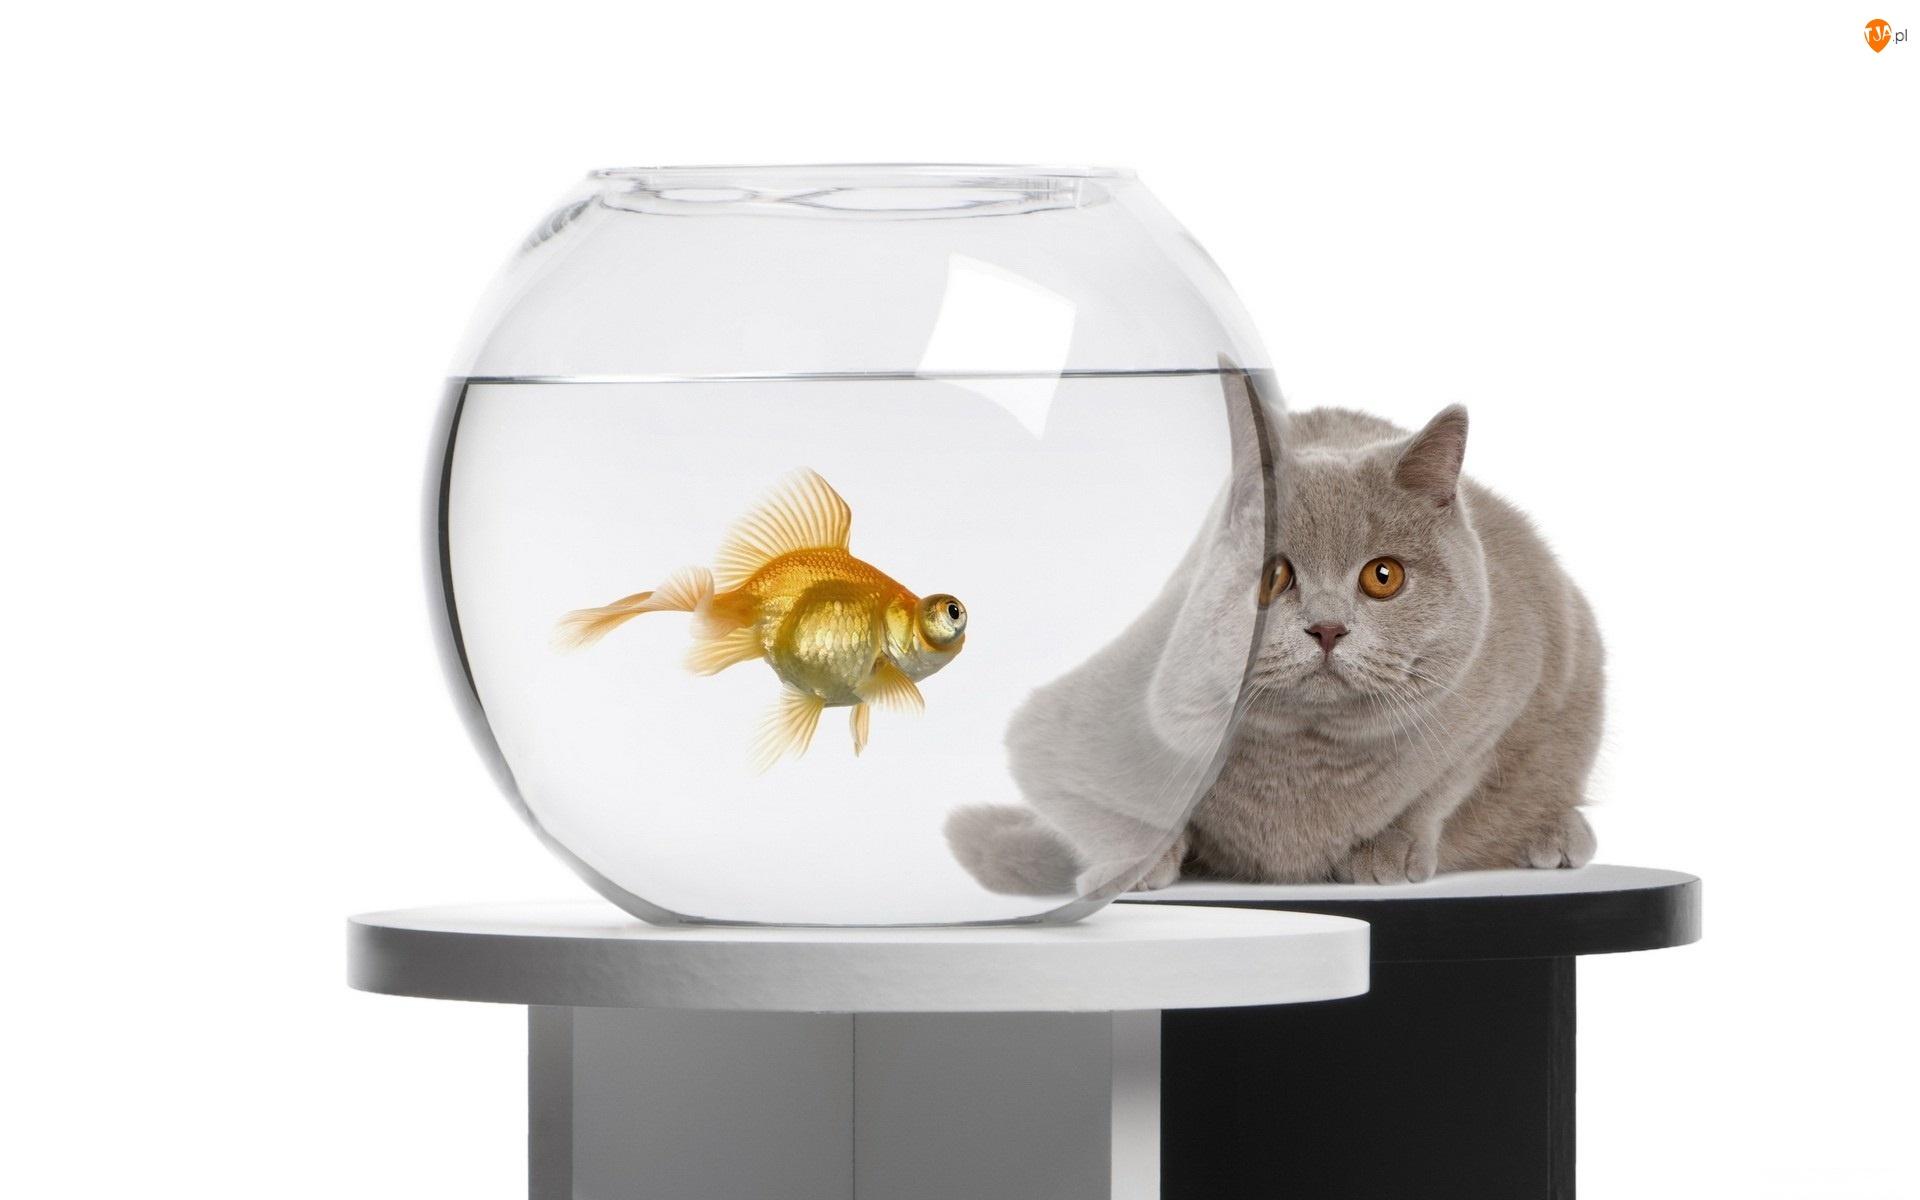 Akwarium, Kot, Kula, Rybka